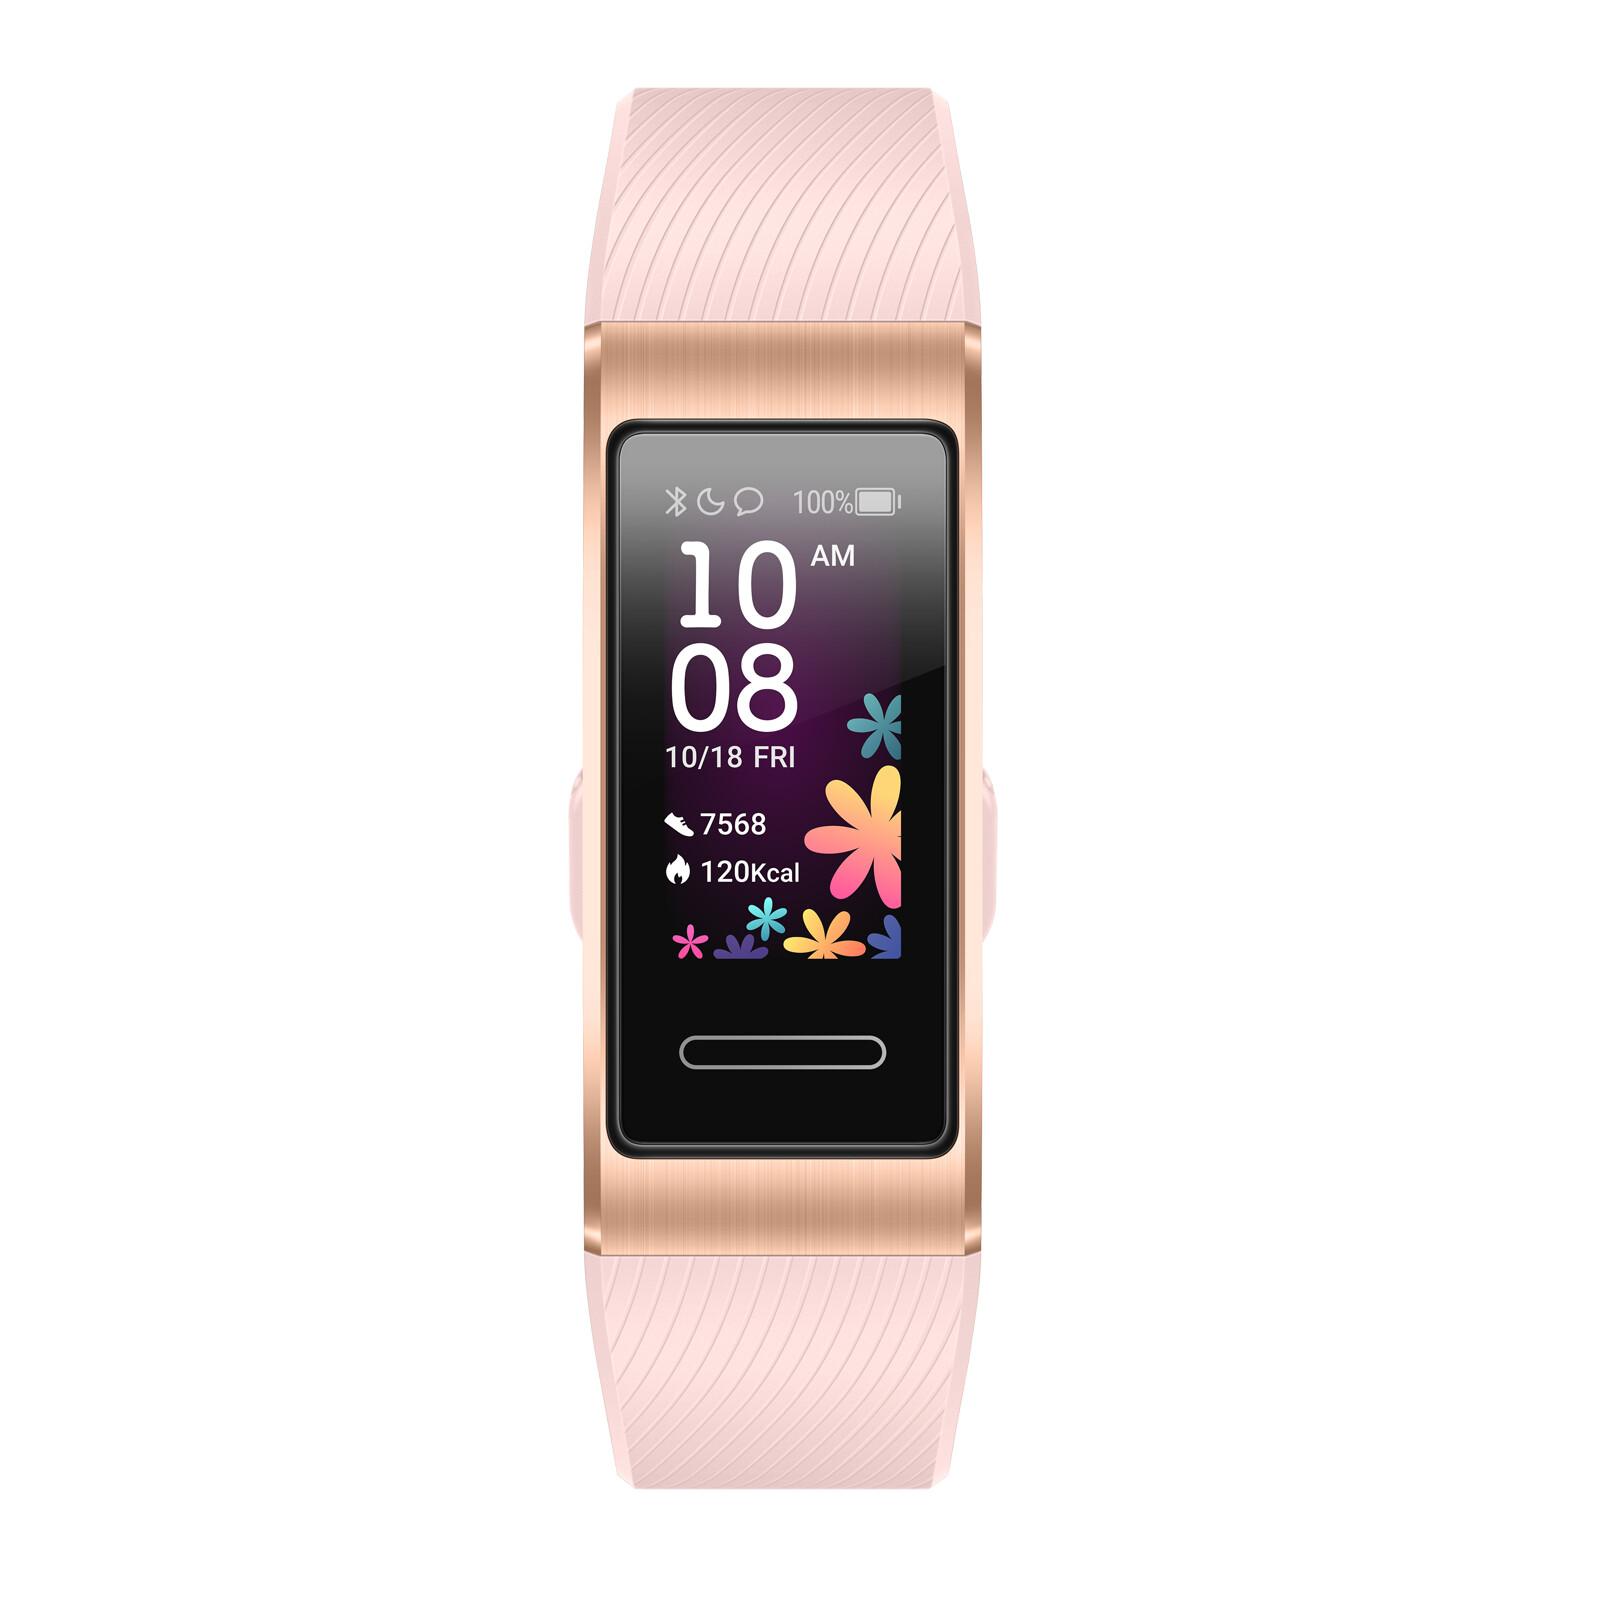 Huawei Band 4 pro pink gold